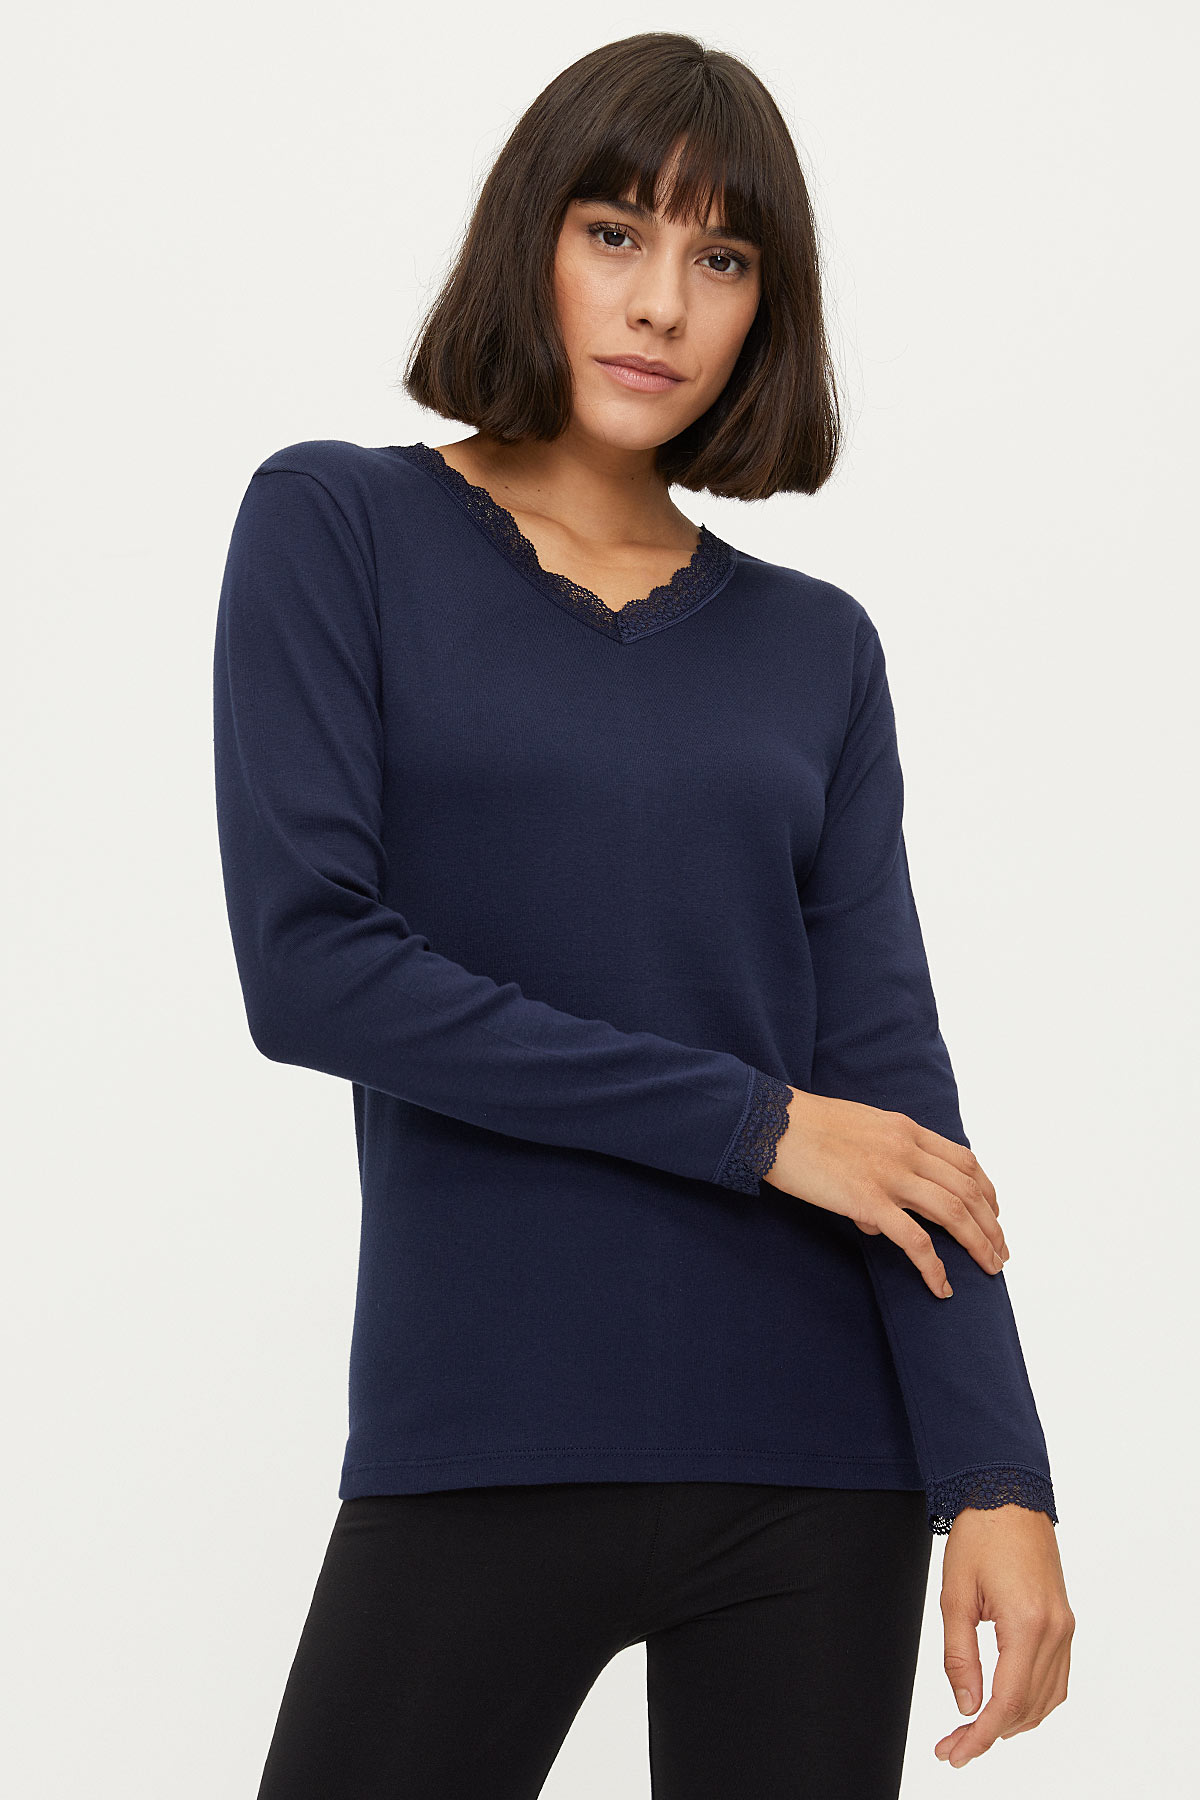 Bross - 100% Cotton Lace Long Sleeved Women's Flannel